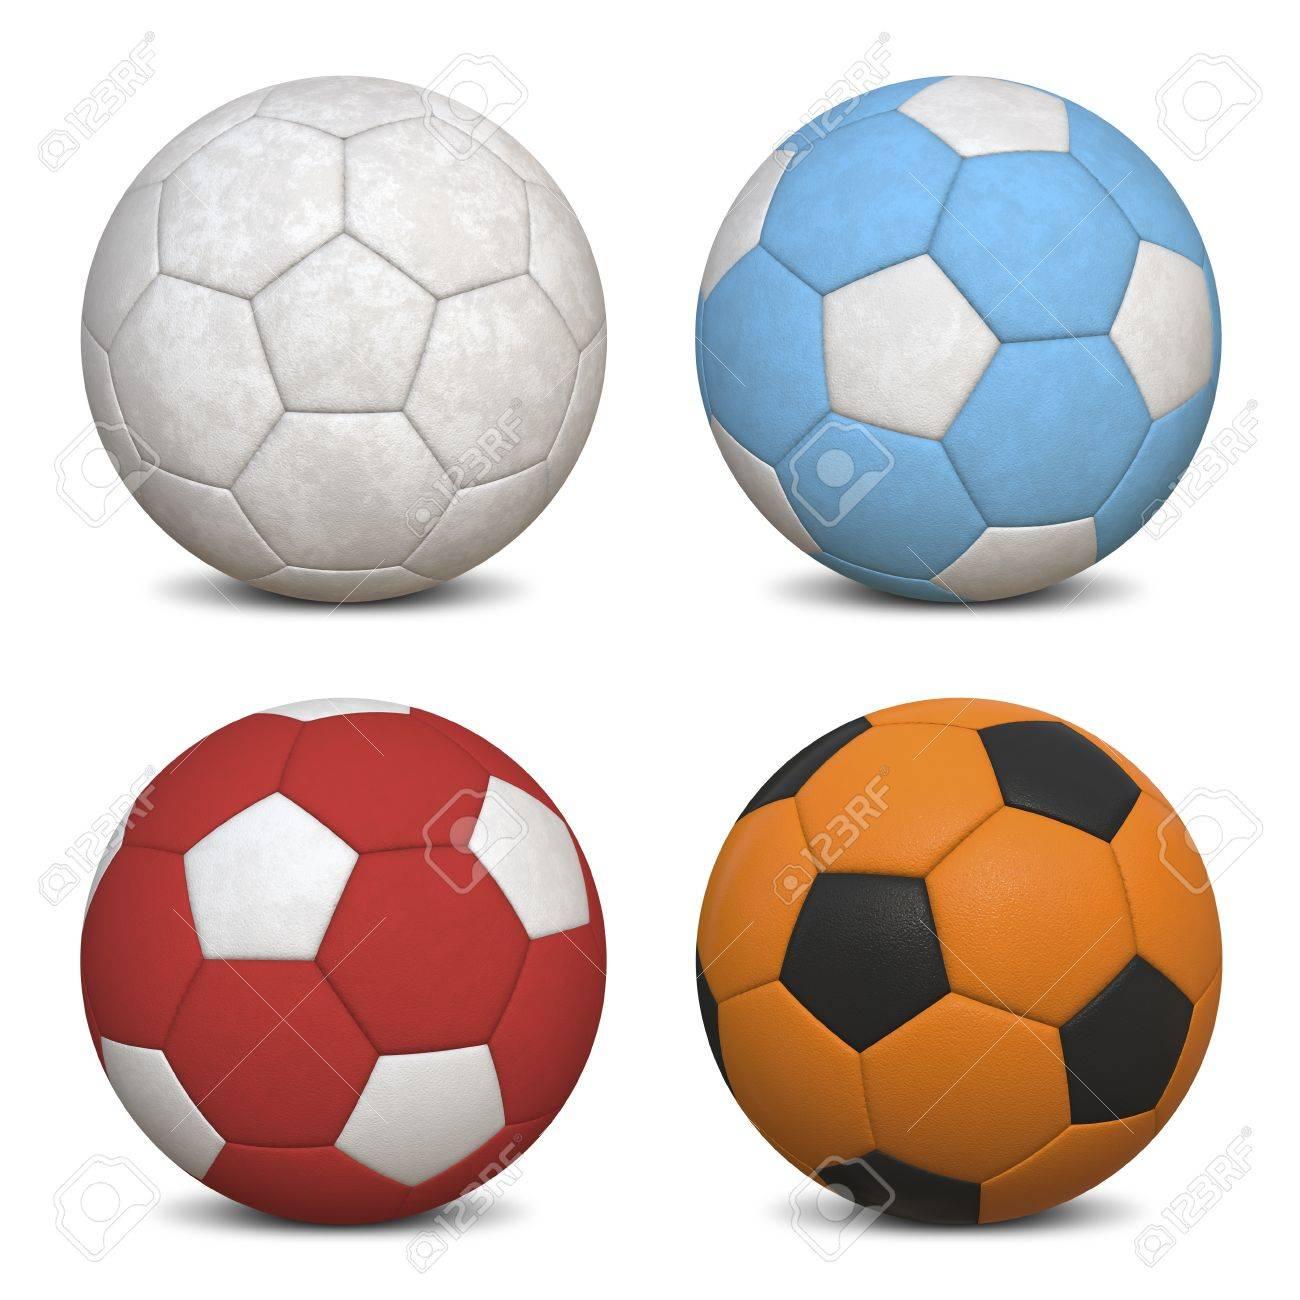 Four Soccer Balls - Hyper Realistic 3D Illustrations Stock Photo - 13227001